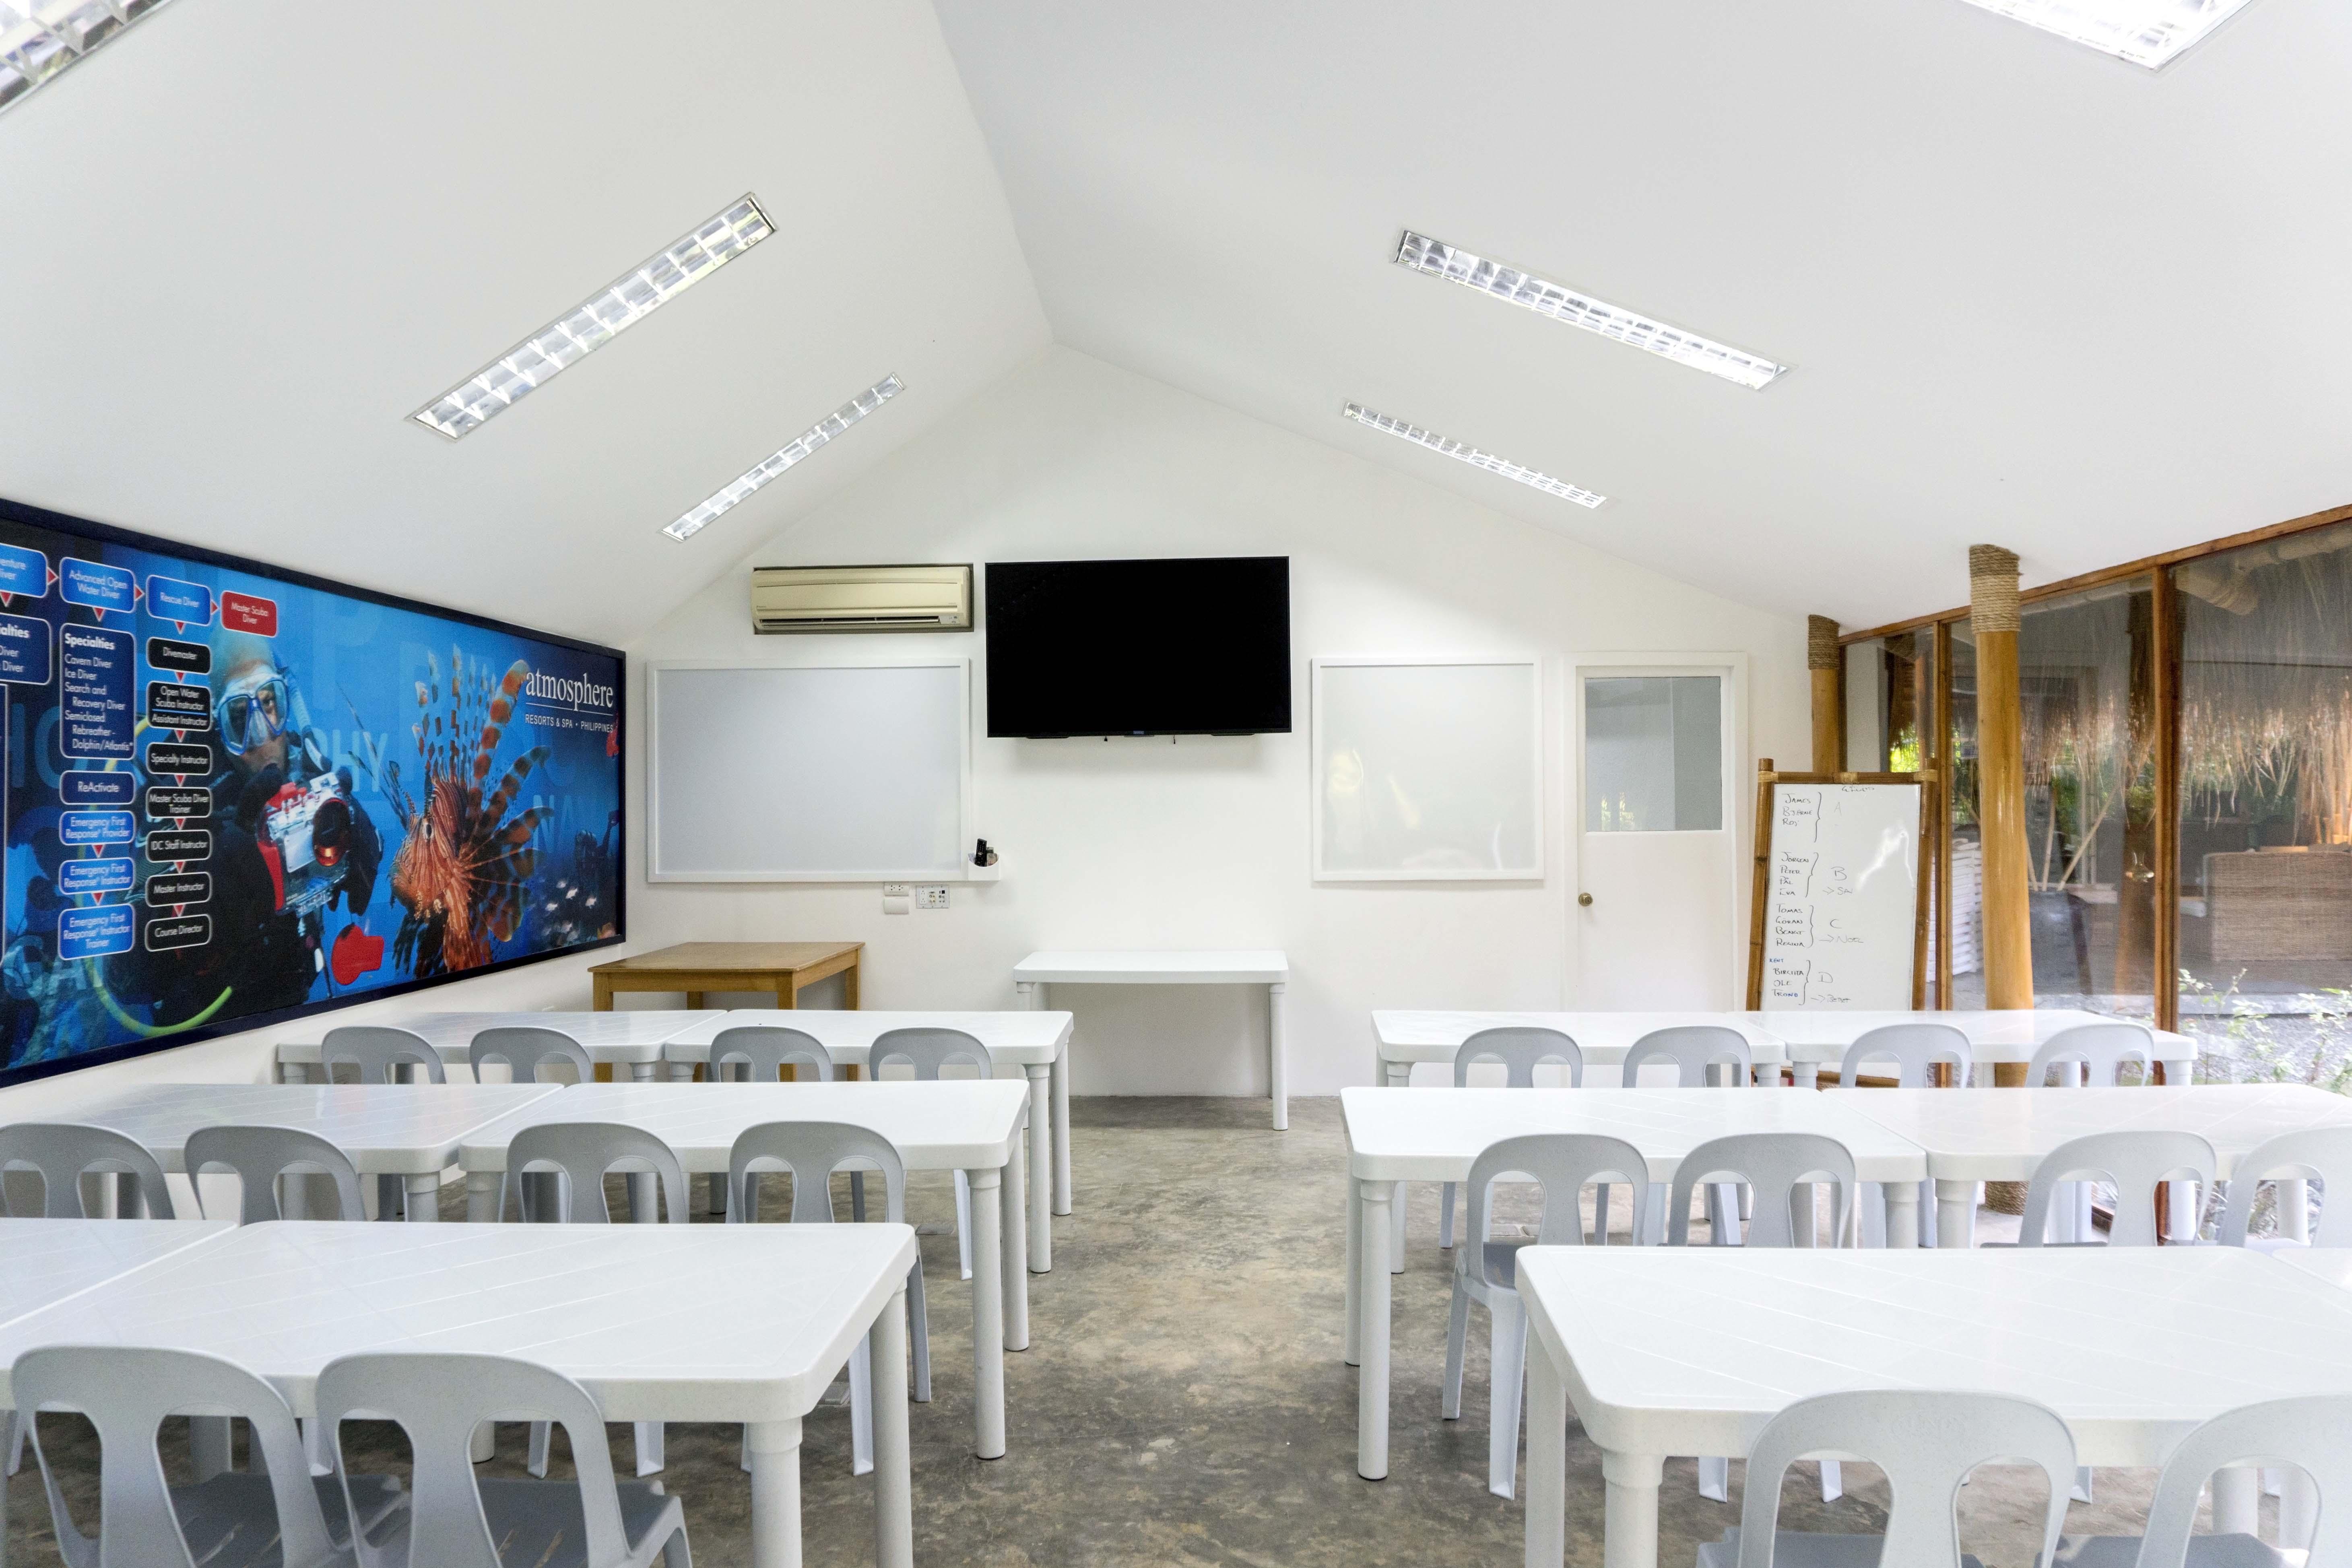 Atmosphere PADI Diving courses classroom enlargement